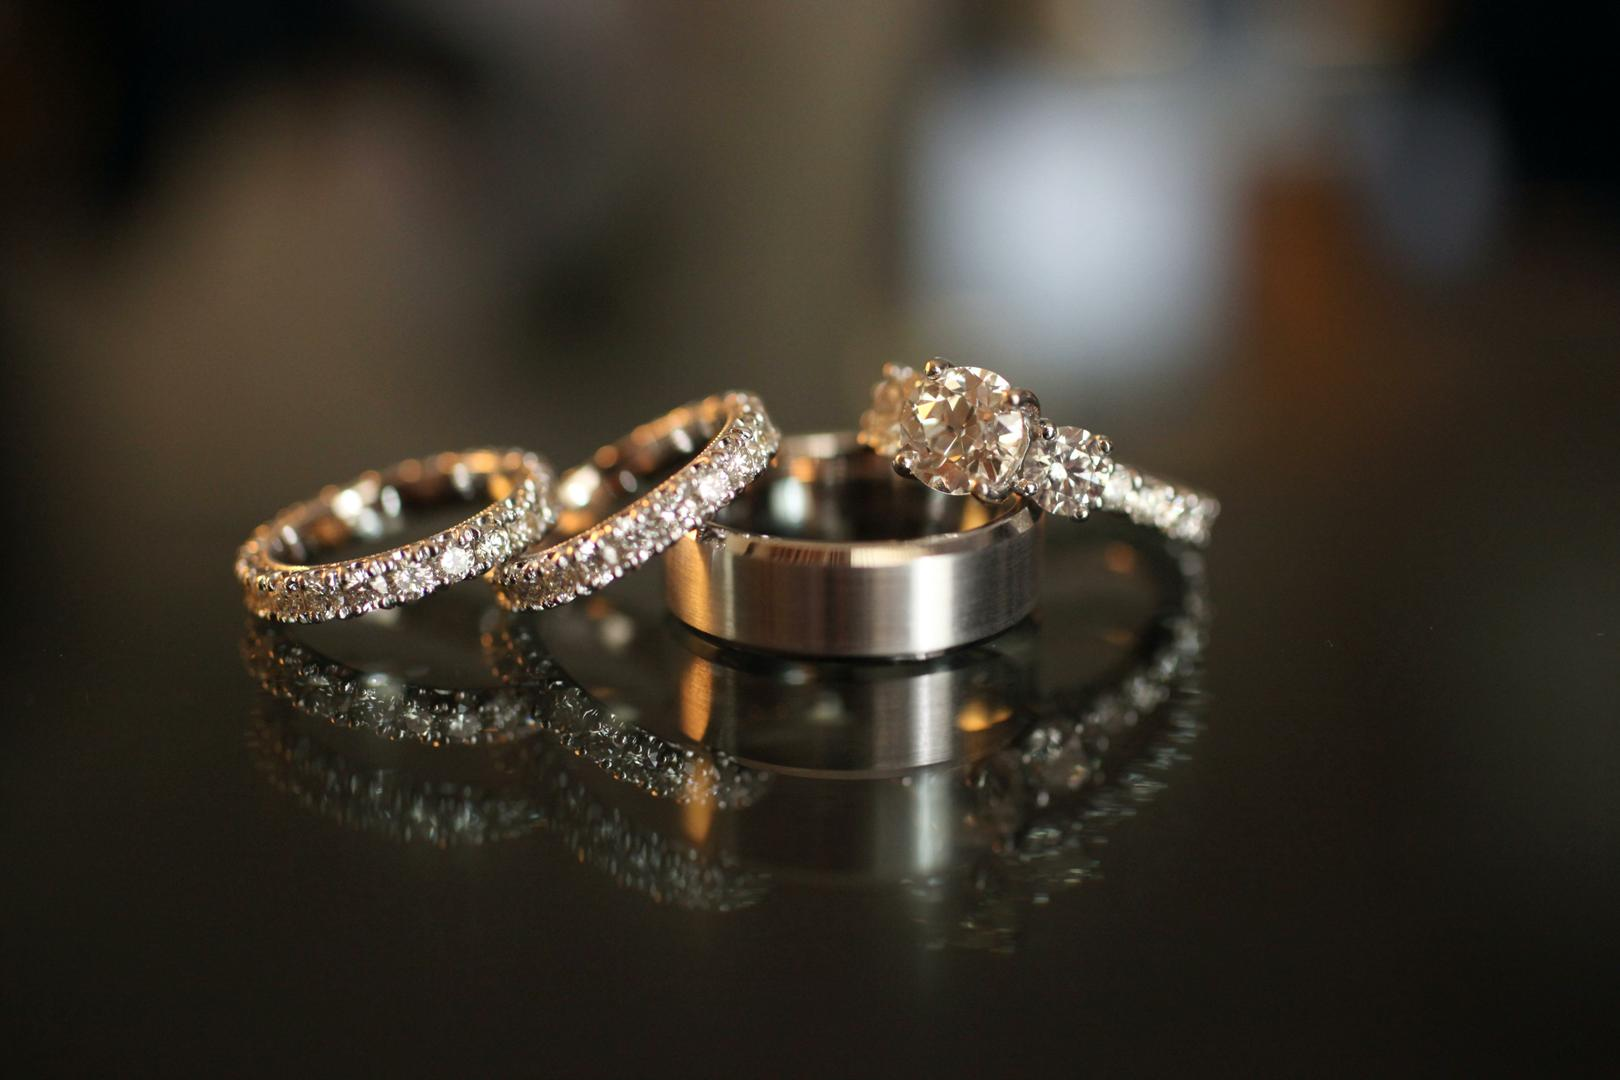 Inspiring Wedding Ring Sets for Brides & Grooms Inside Weddings